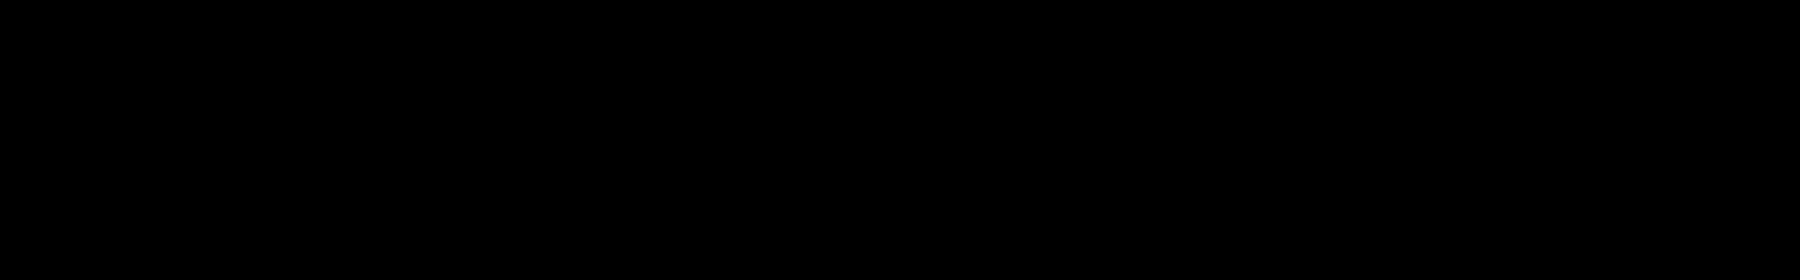 Glitch Hop audio waveform